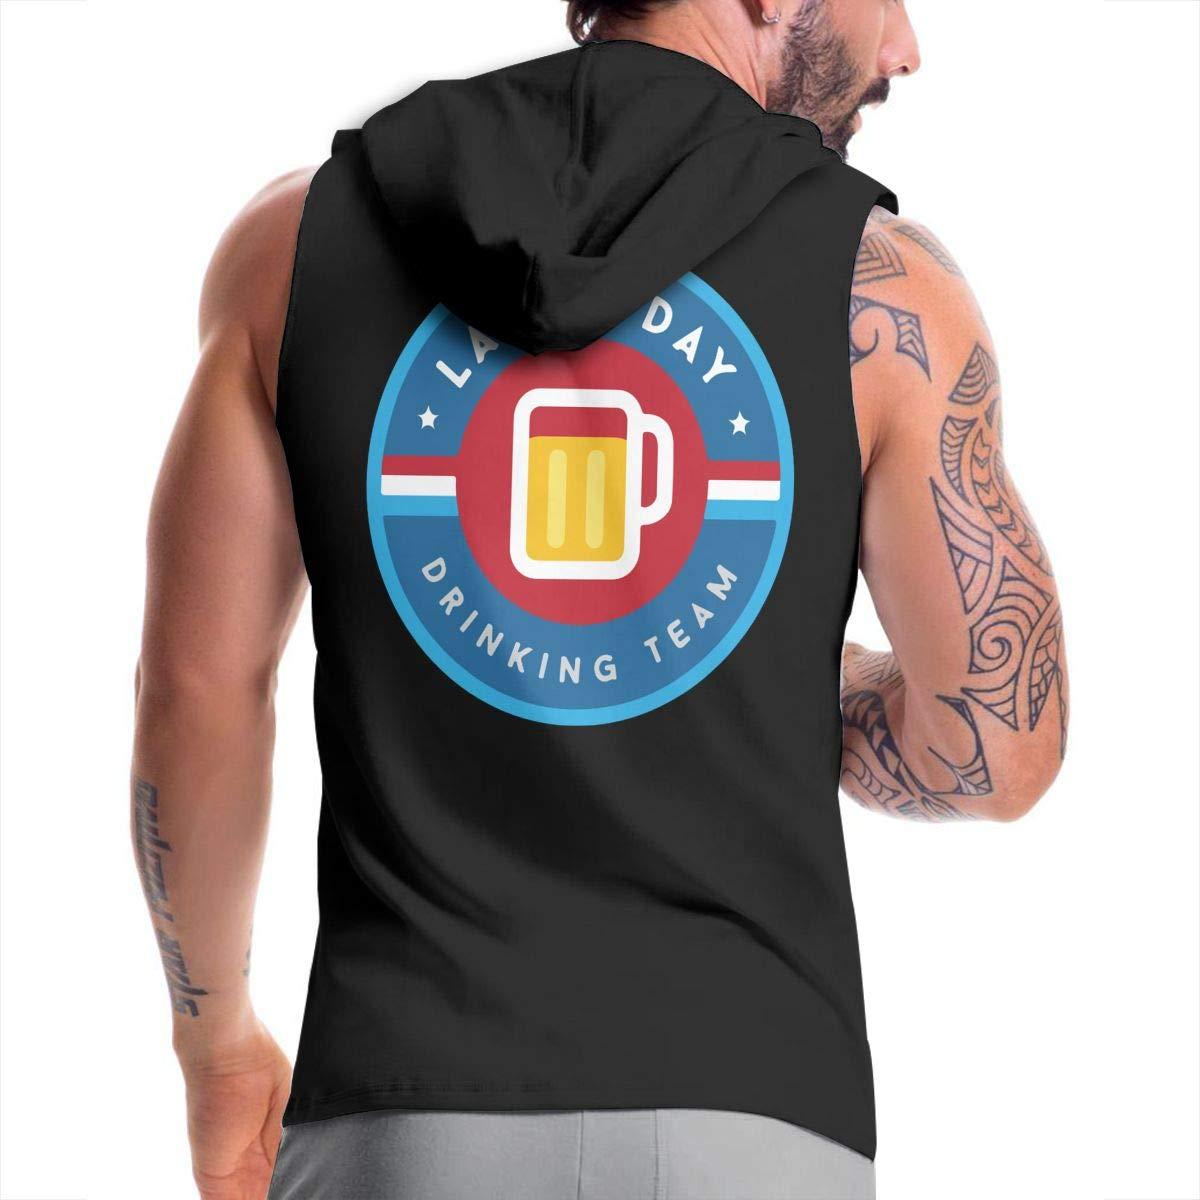 Labor Day Drinking Team Zip Up Vest BMWEITIHBQ Mens Sleeveless Sweatshirt